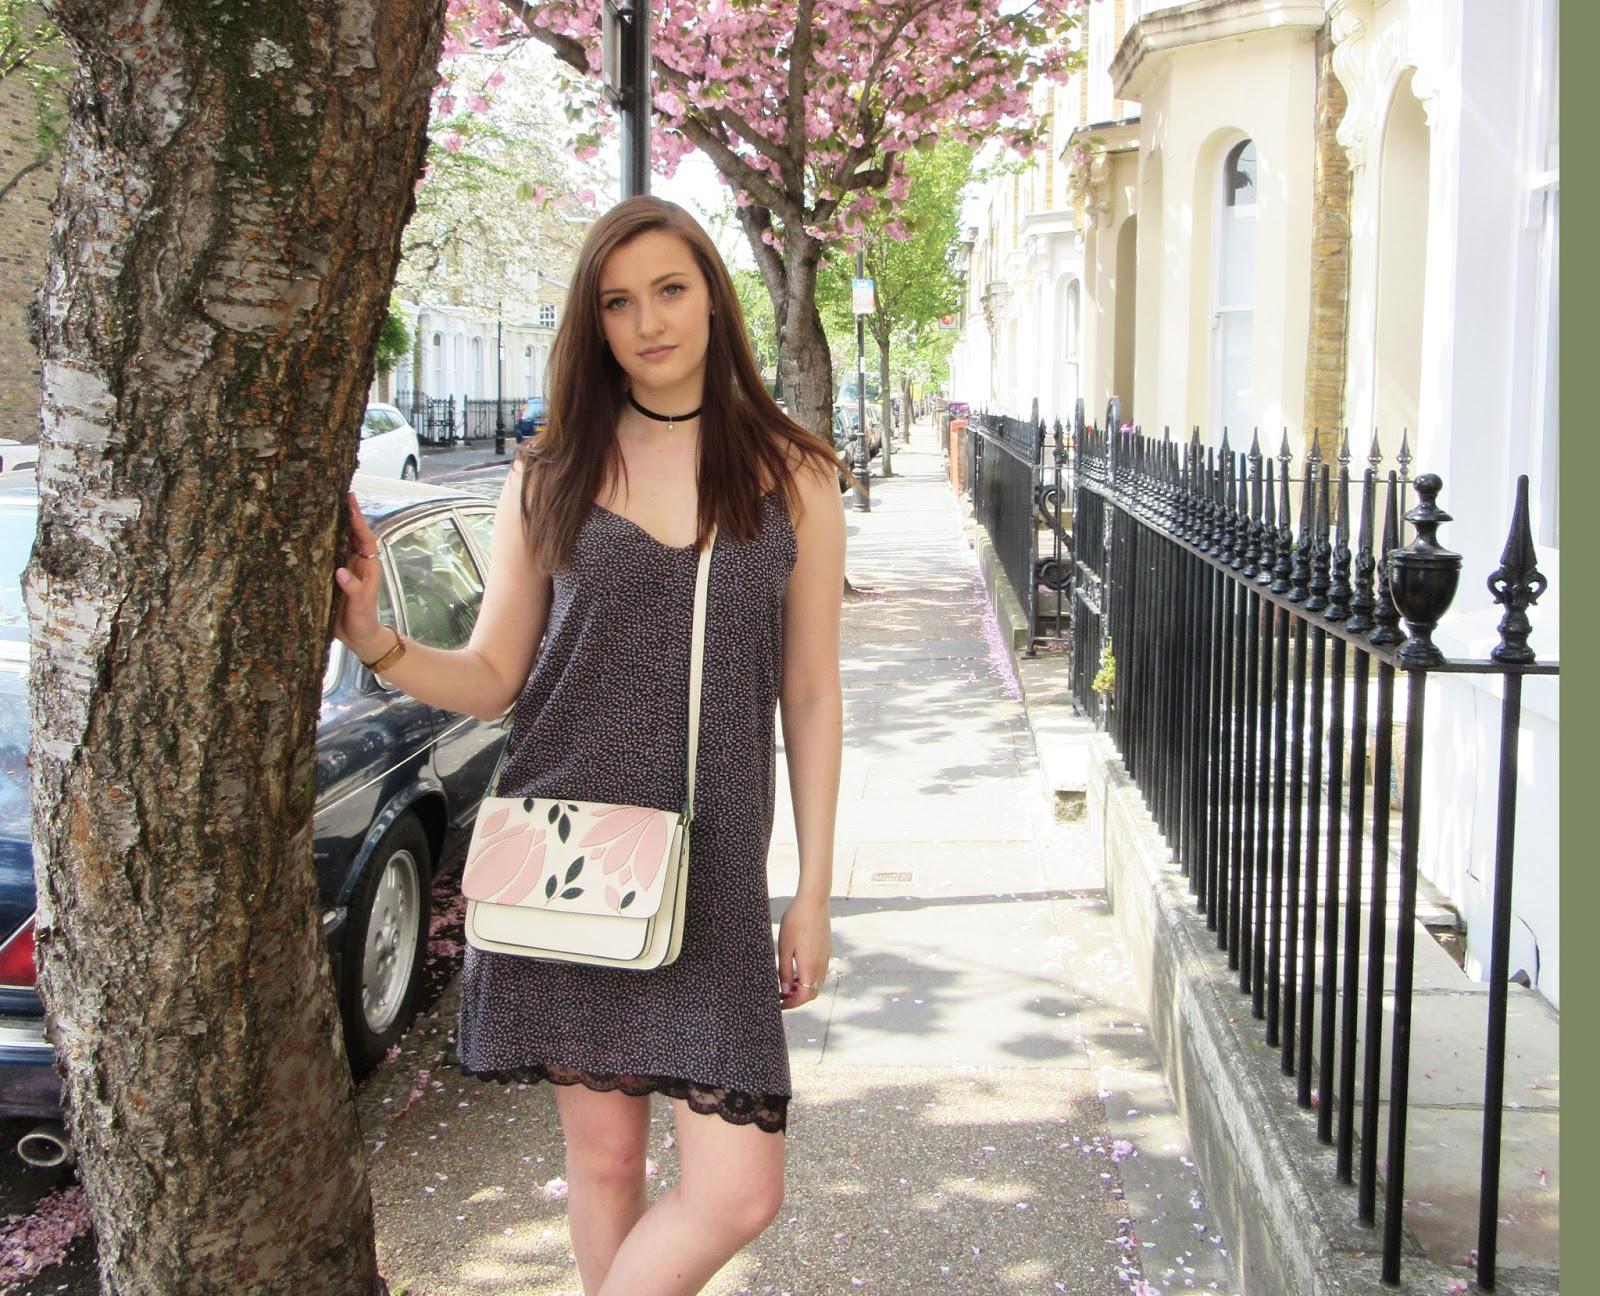 Pretty In Pink // Floral Slip Dress & Public Desire Nude Boots // Fashion OOTD WIWT STREET STYLE // London Blogger // Lauren Rose Bell